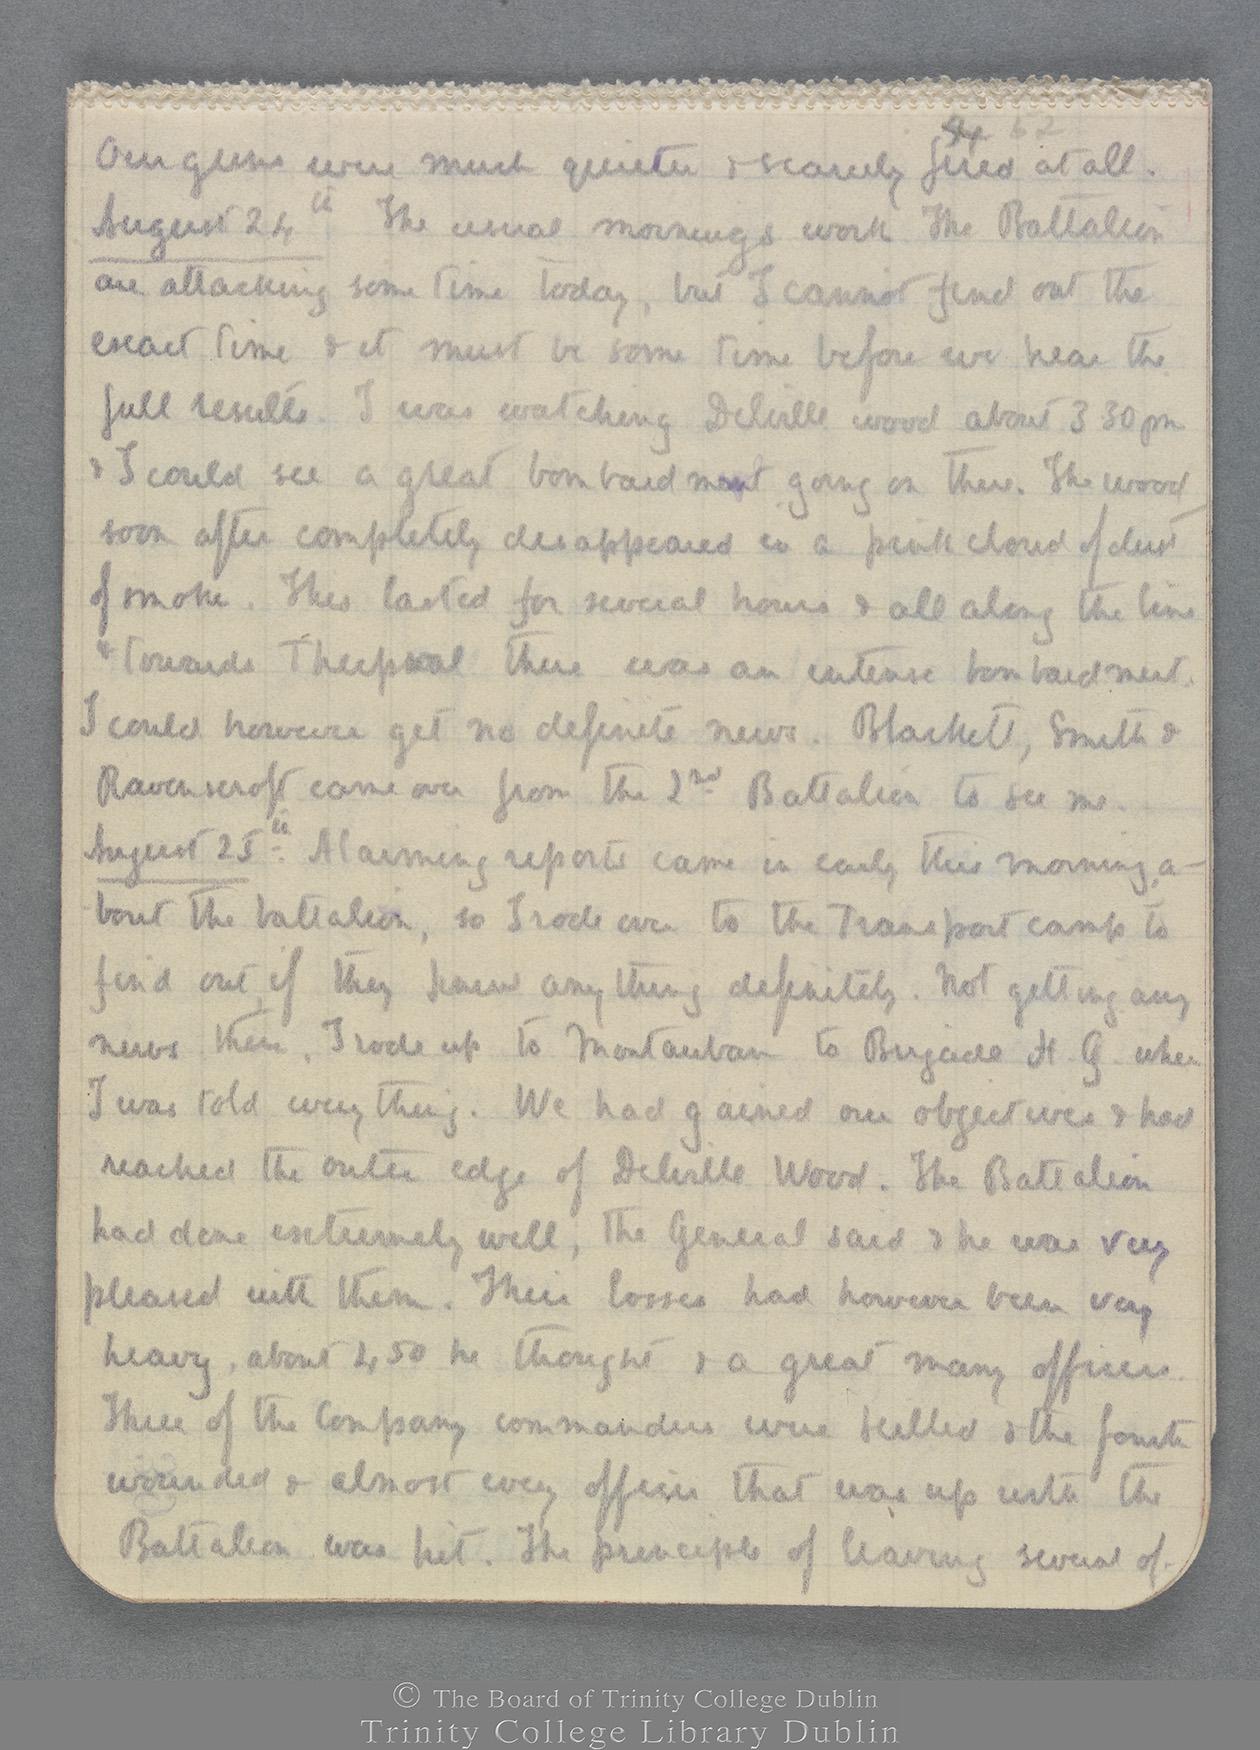 TCD MS 10821 folio 54 recto